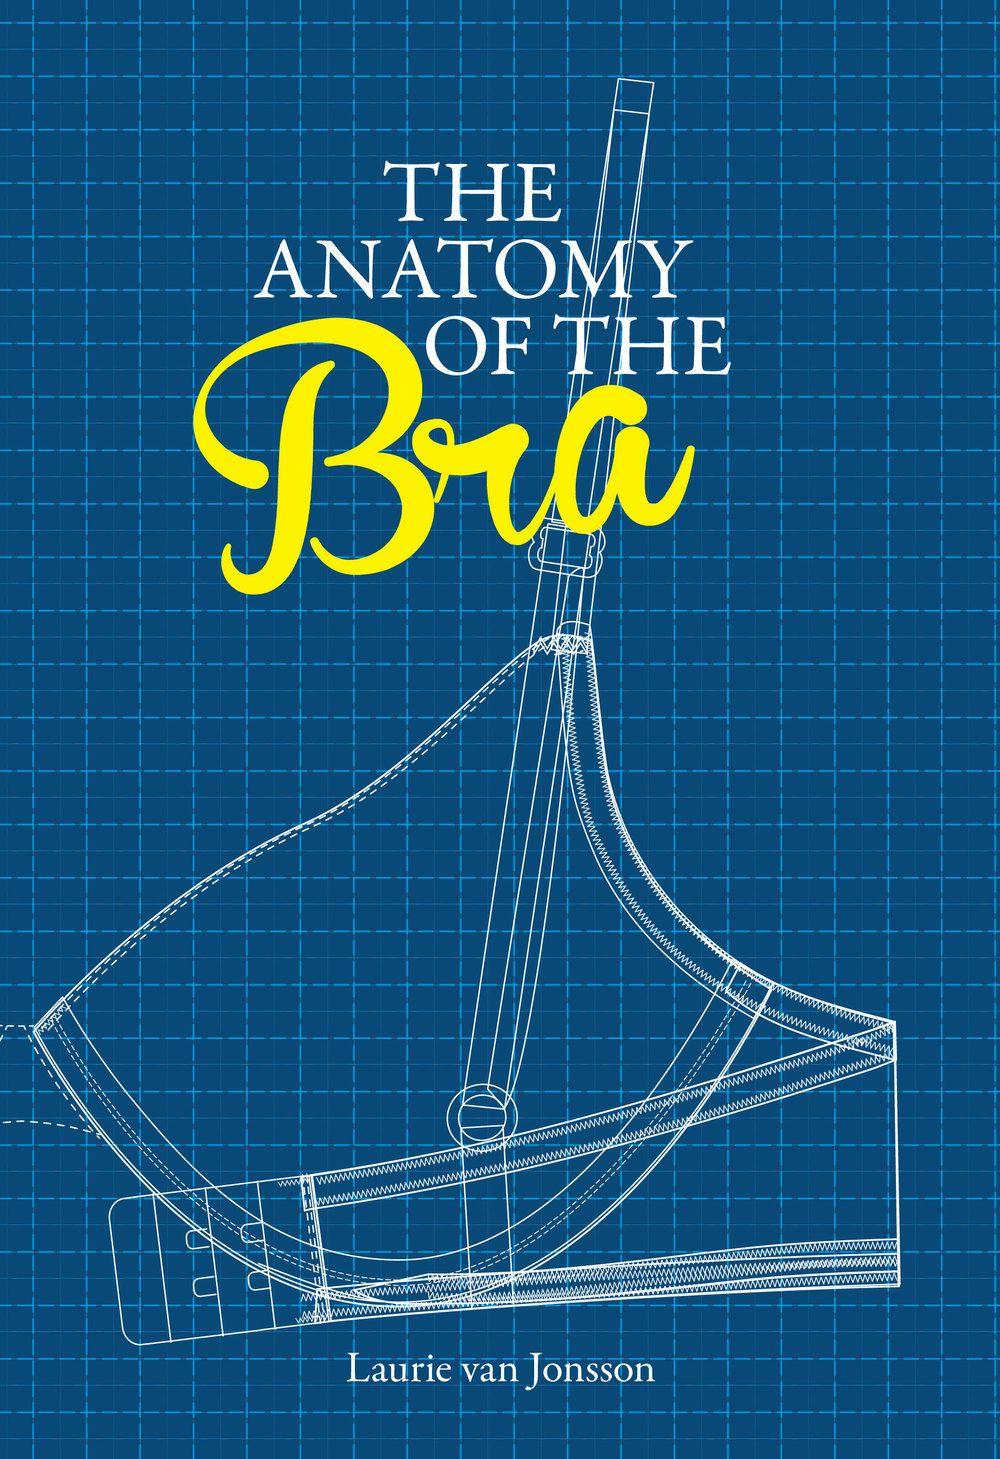 Photo of E-Book: The Anatomy of the bra — Van Jonsson Design